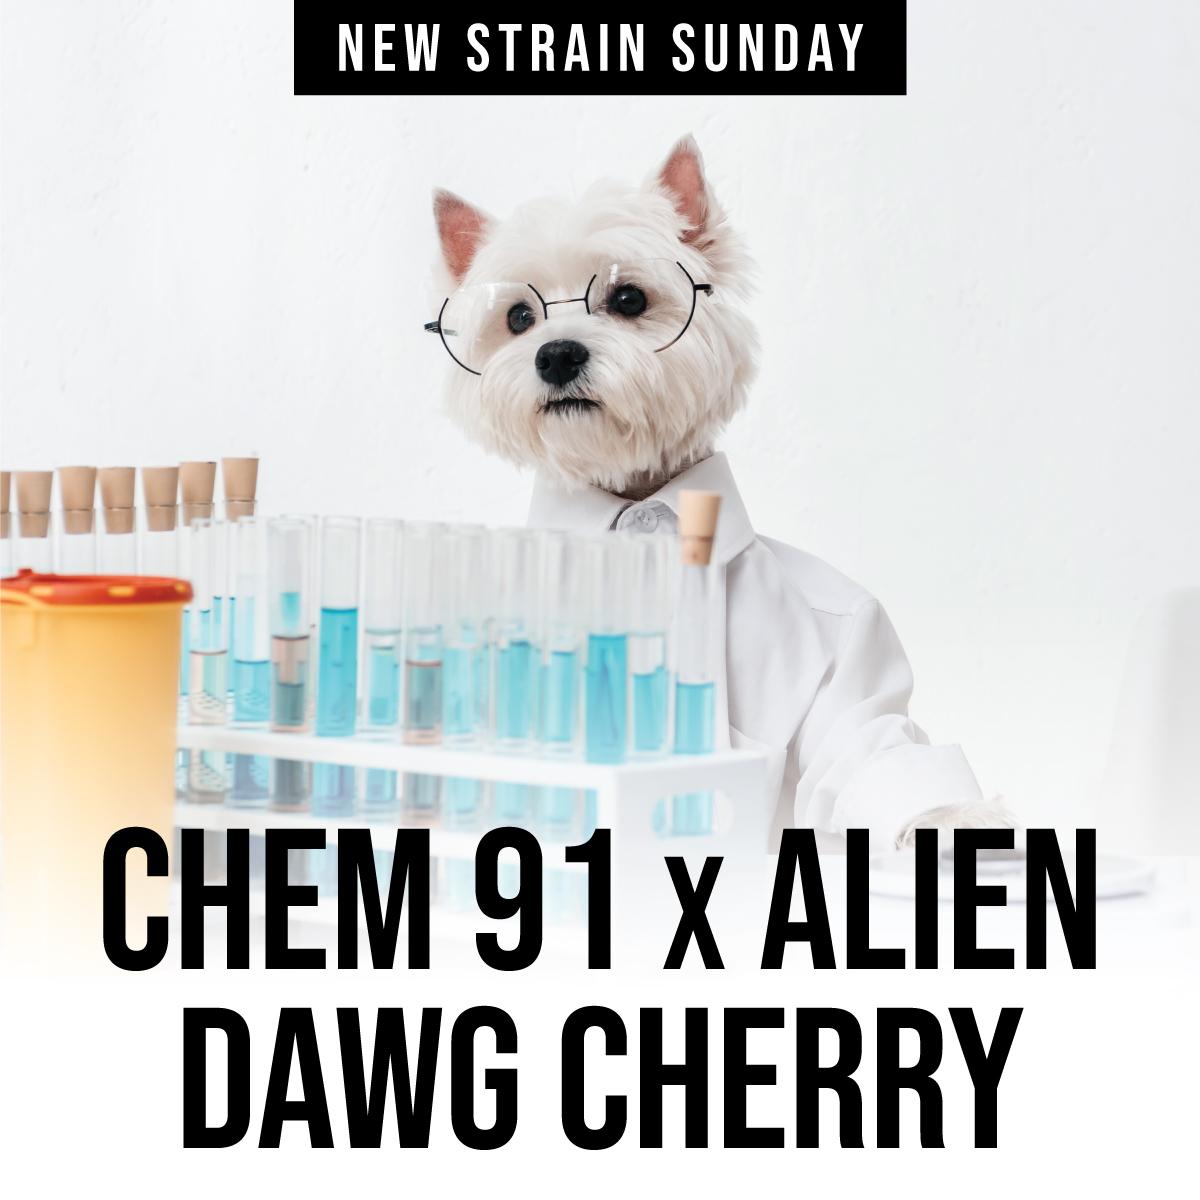 CCM-ChemAlienDawgCherry.jpg